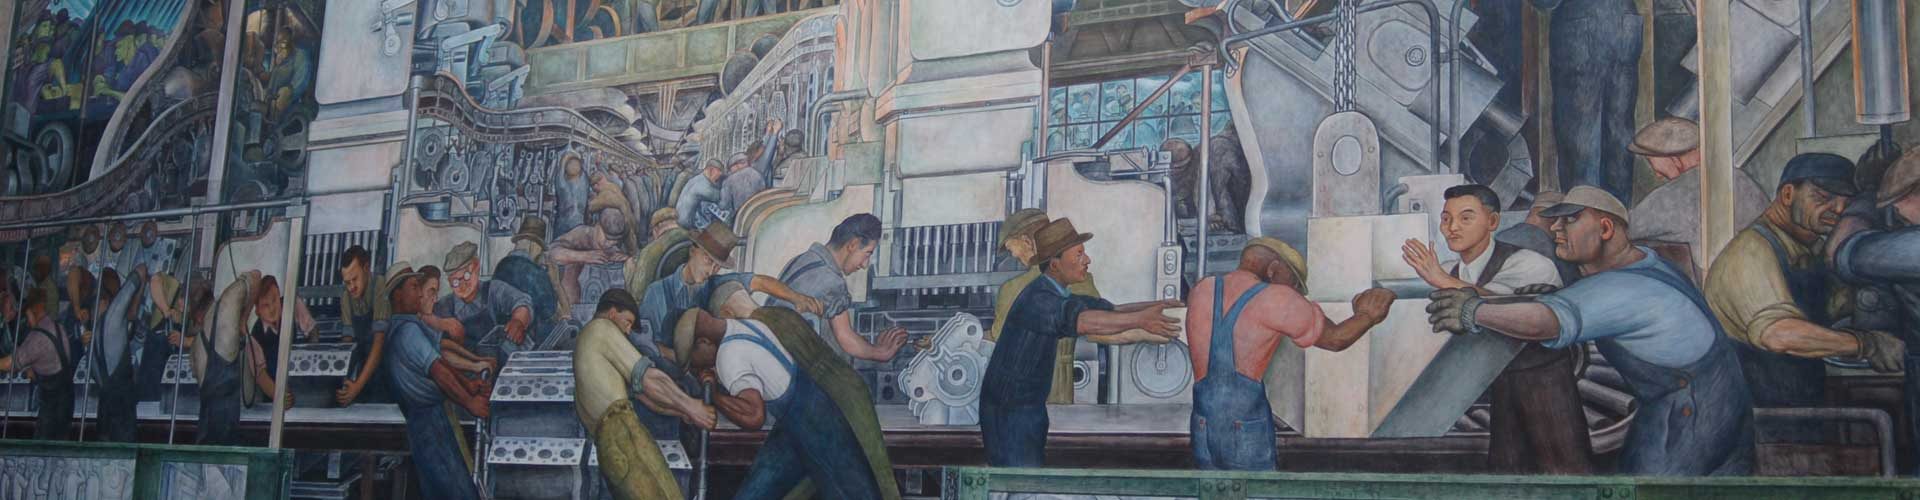 Factory Worker Mural Banner